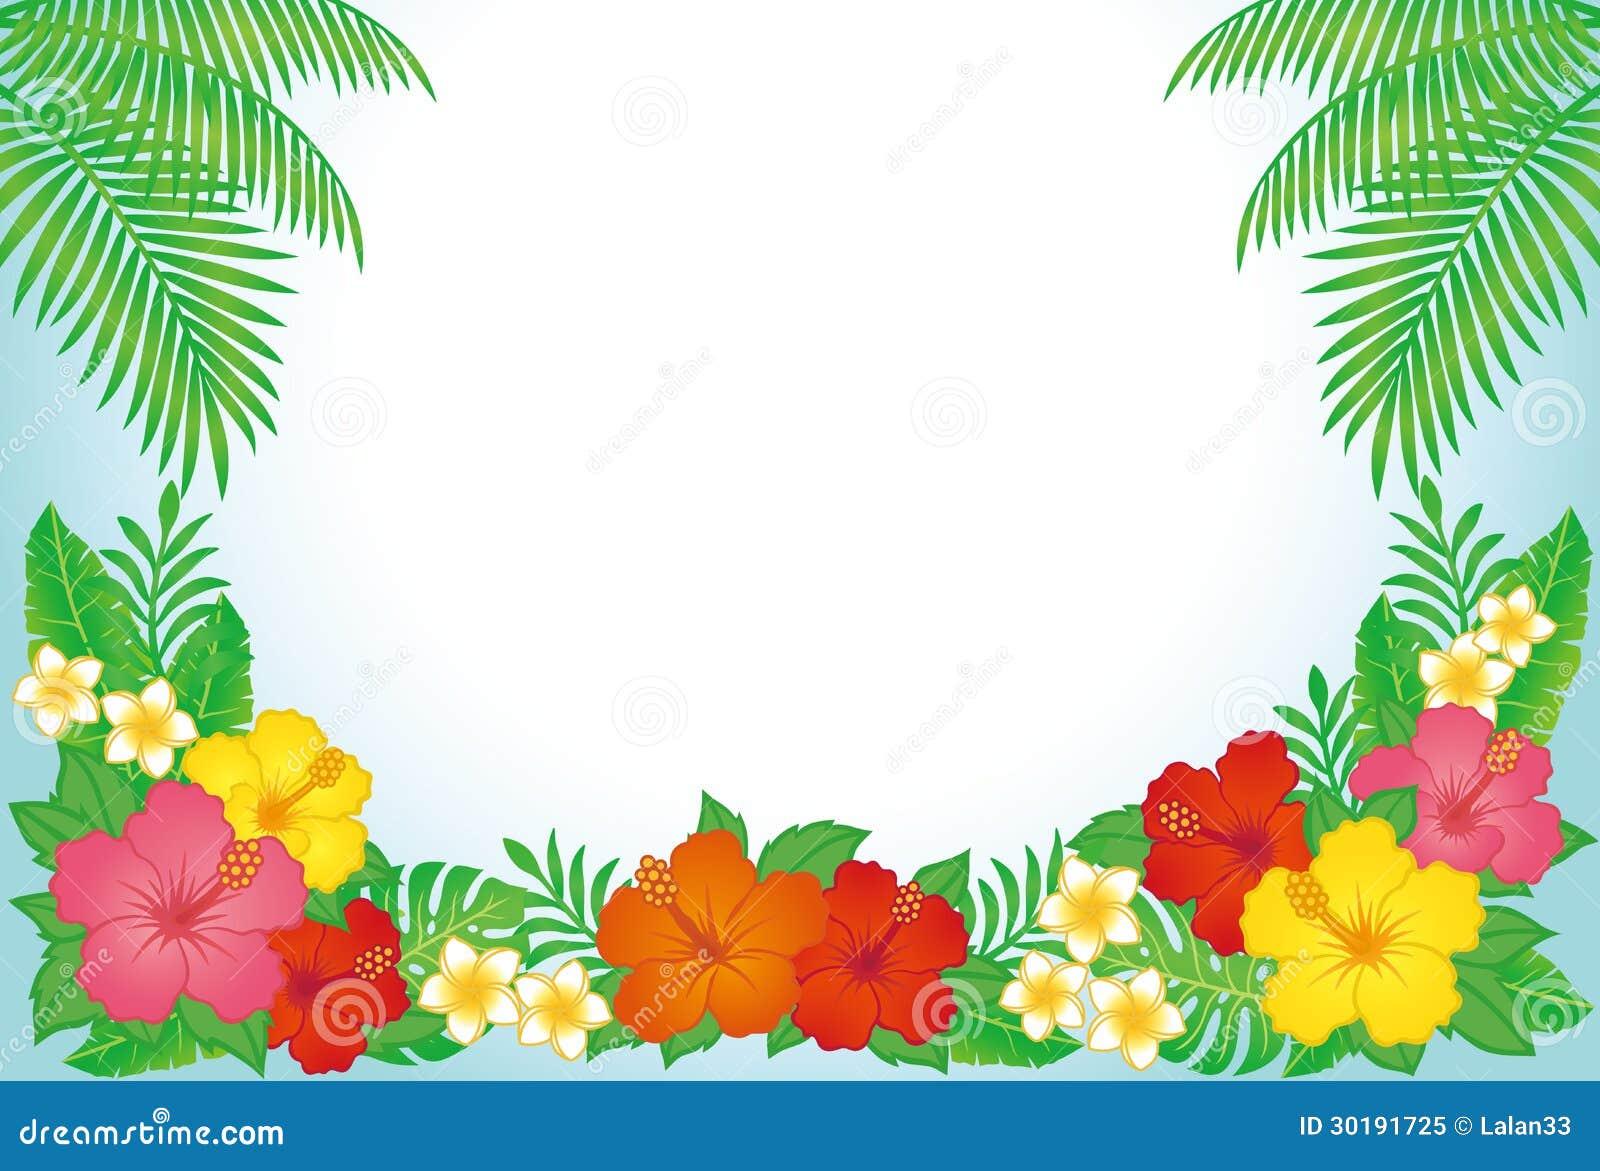 royalpitamaha Bali also Stock Photo Alphabet Fruit Number 5 Image6182130 furthermore Royalty Free Stock Photos Drain Drops Image6910948 as well Stock Photos Woman Relaxing Hammock Image13041093 likewise 37206. on tropical settings